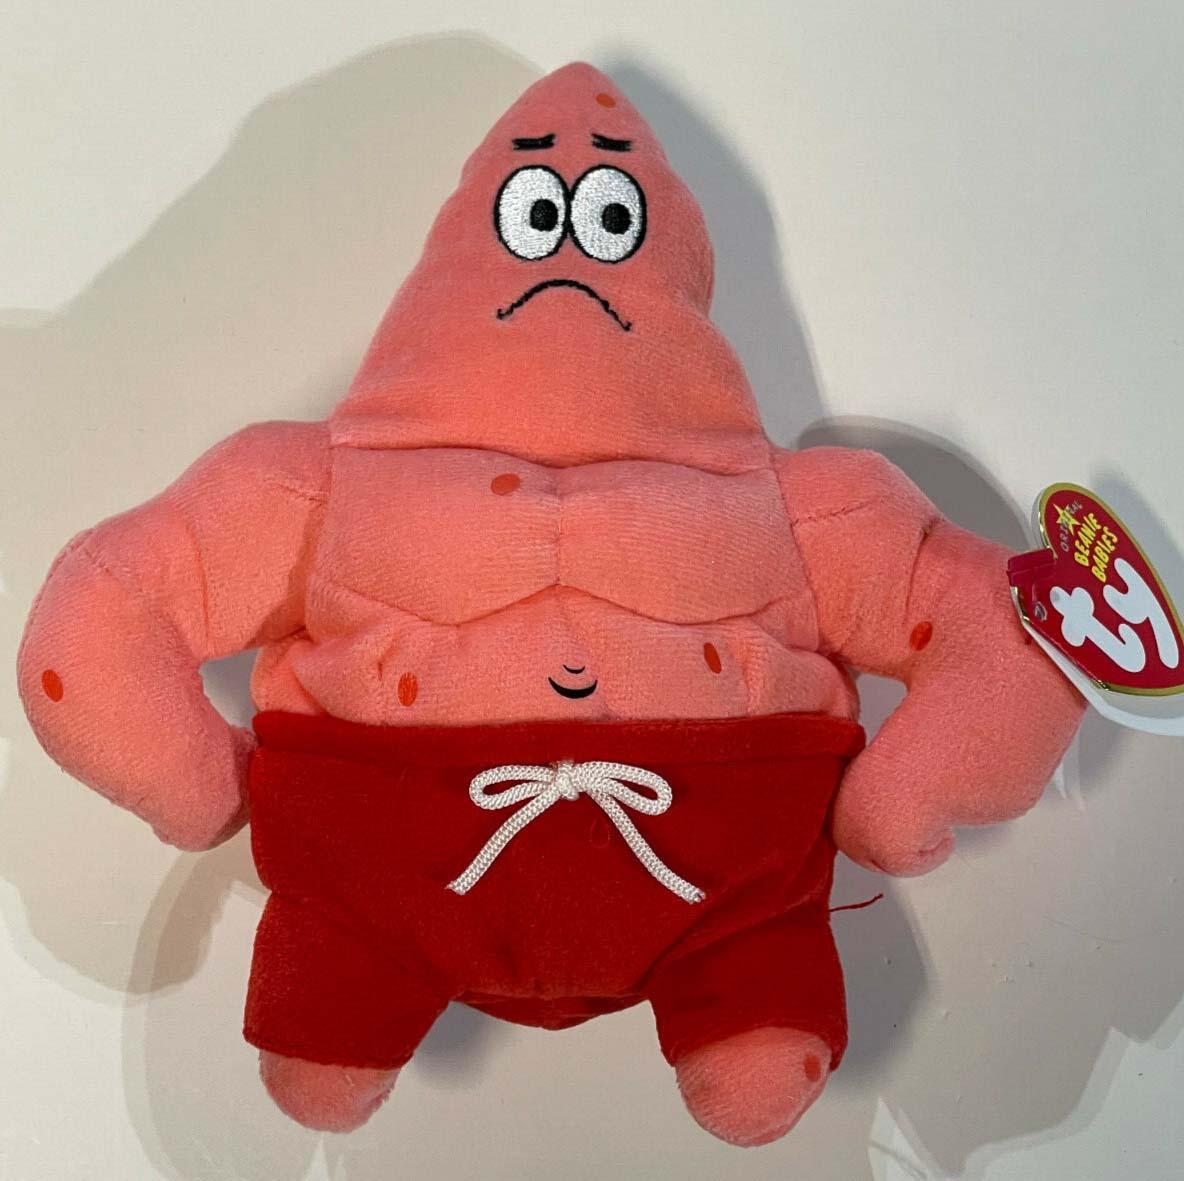 SpongeBob_Patrick_Muscle_Man.jpg